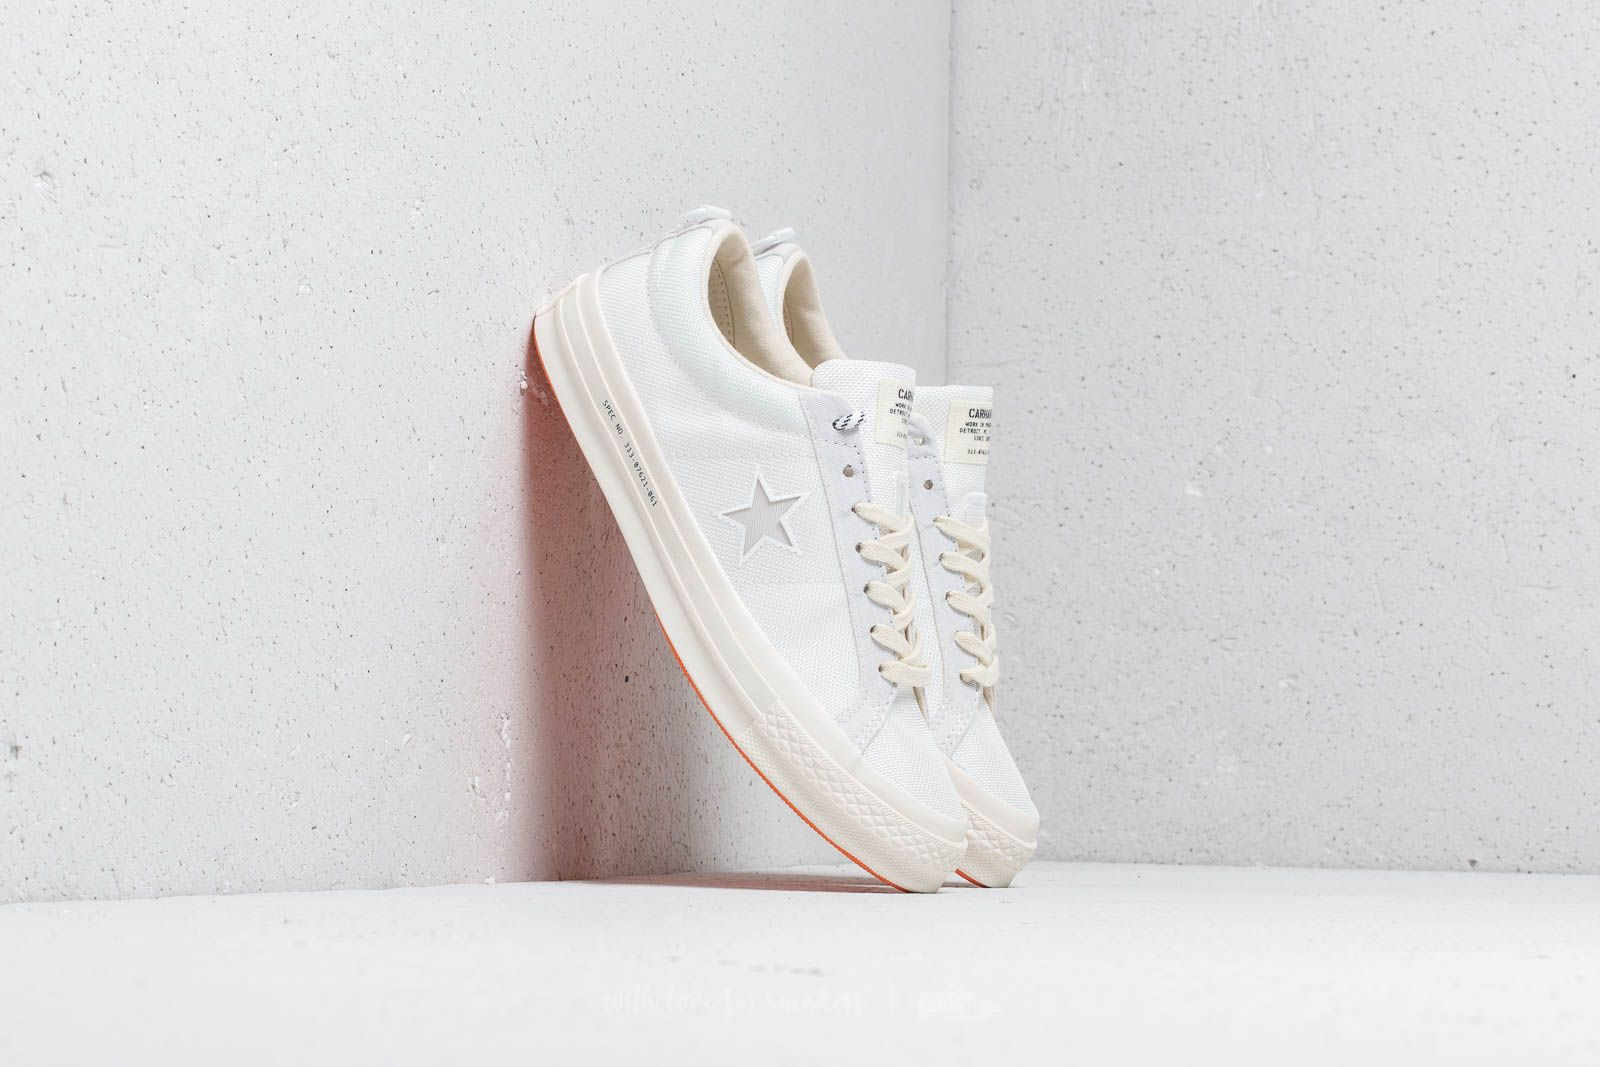 72a9432e322ebd Converse x Carhartt WIP One Star OX White  White  Vibrant Orange ...